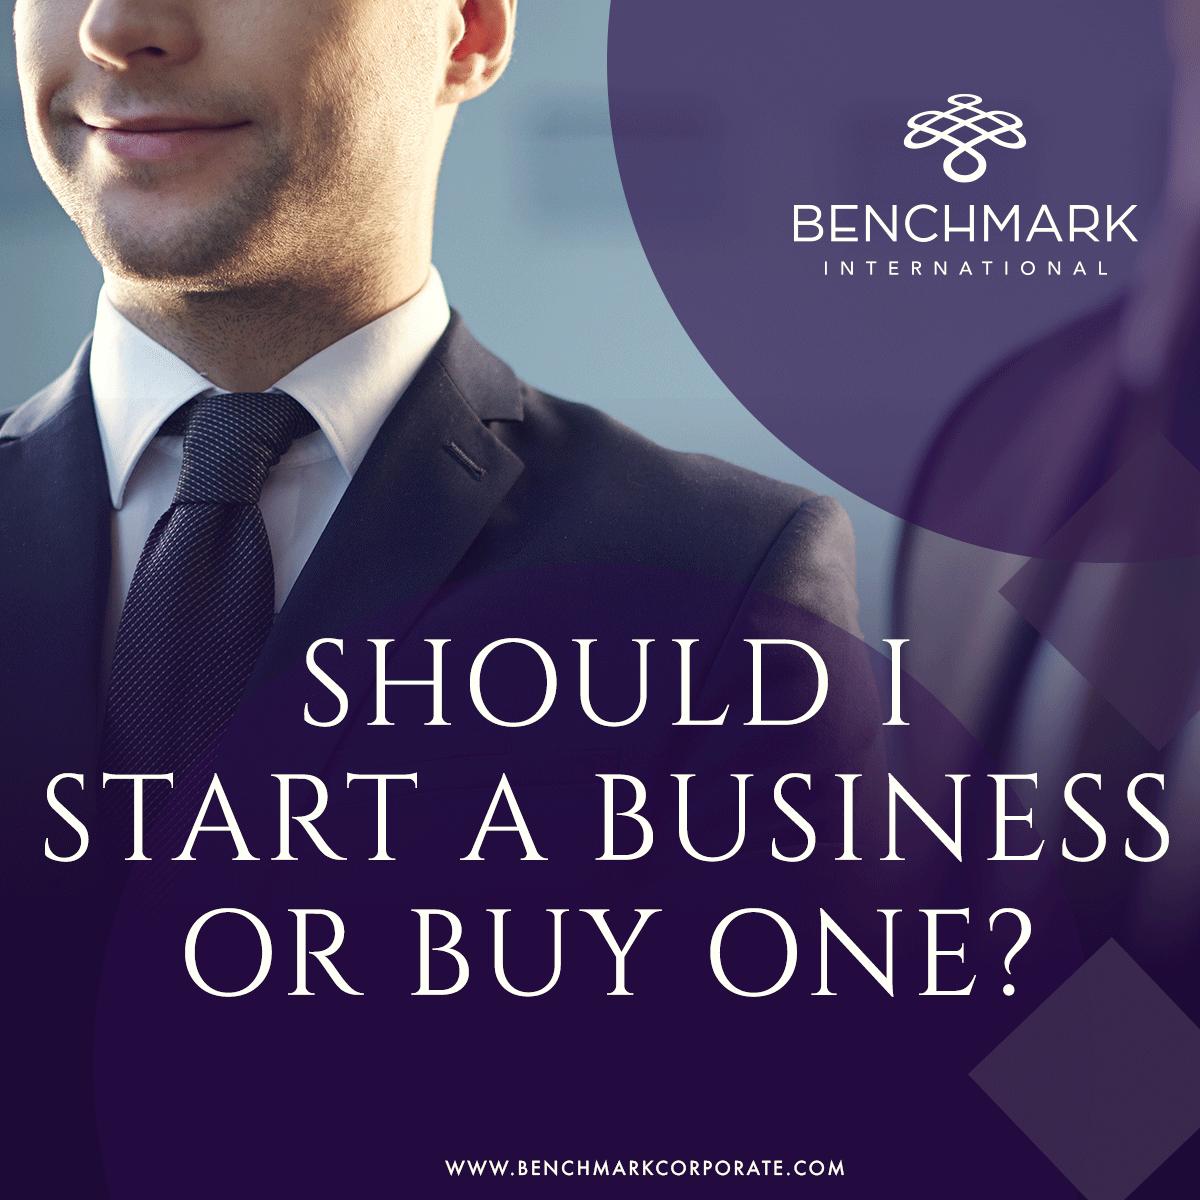 start-business-or-buy-one-social